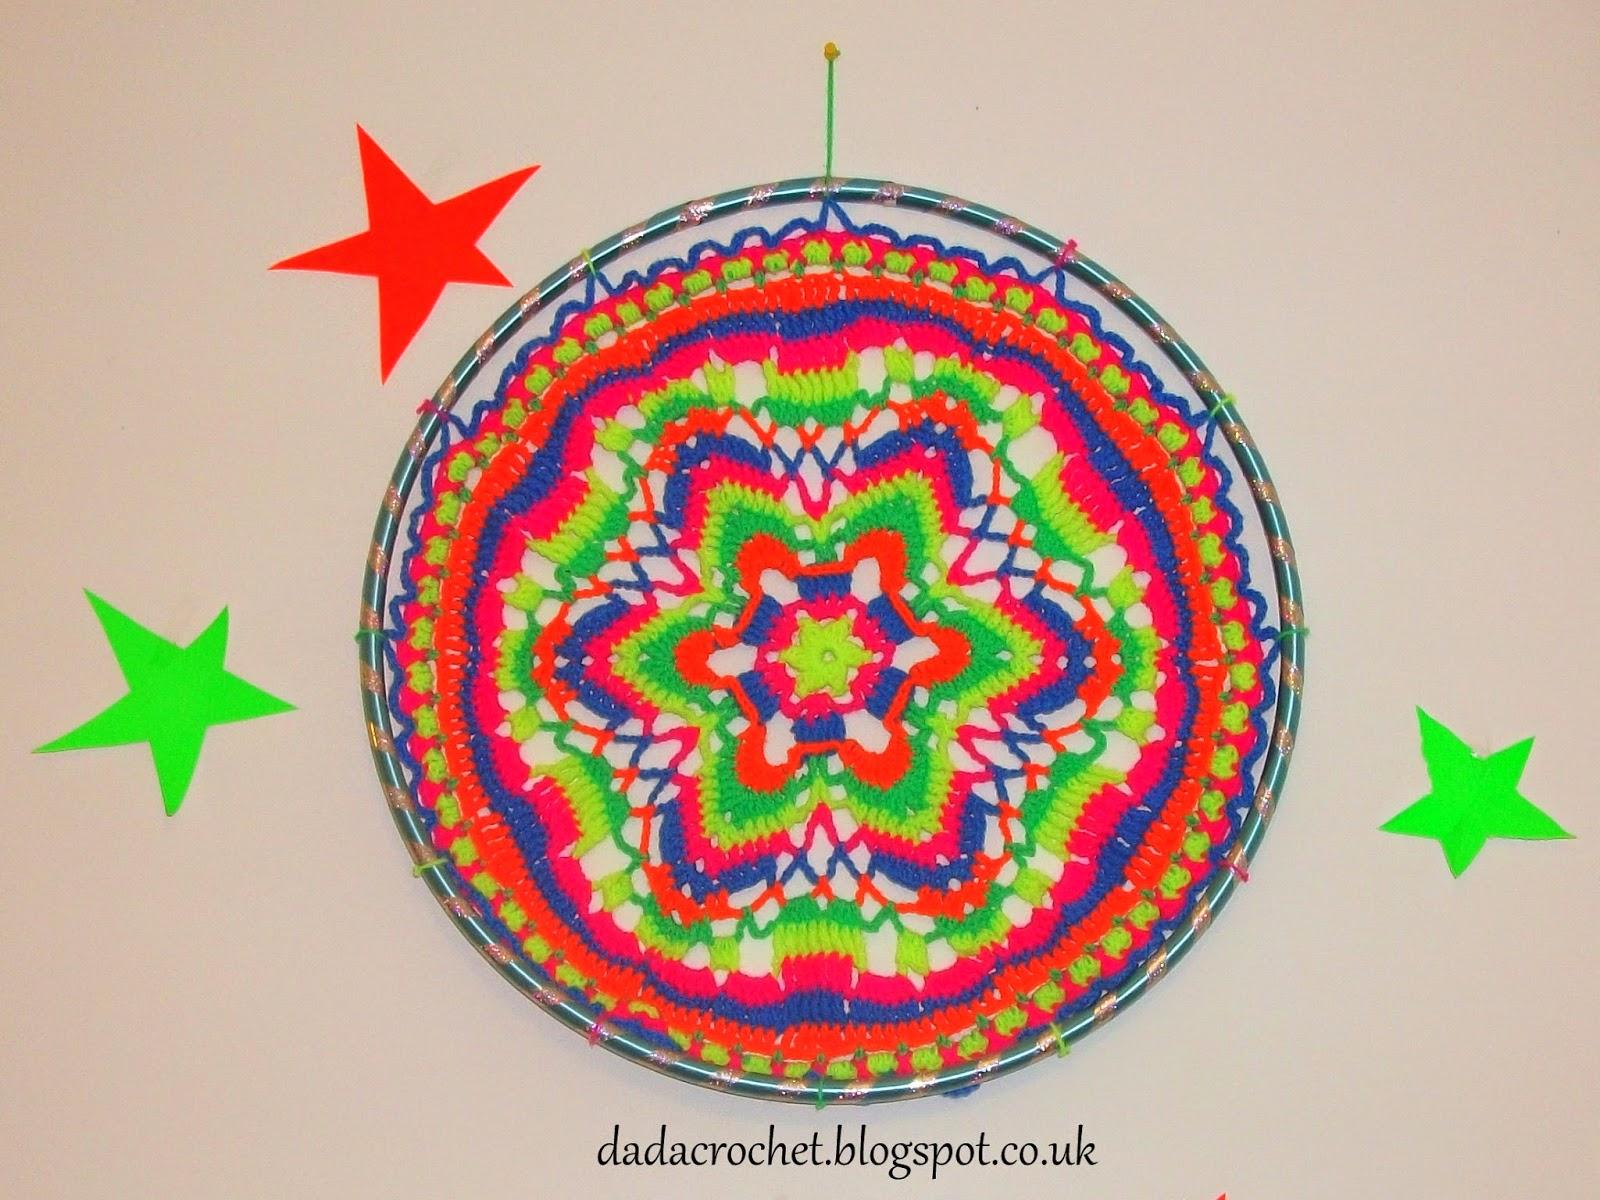 Dada Neon Crochet Create Your Own Wall Hanging Mandala